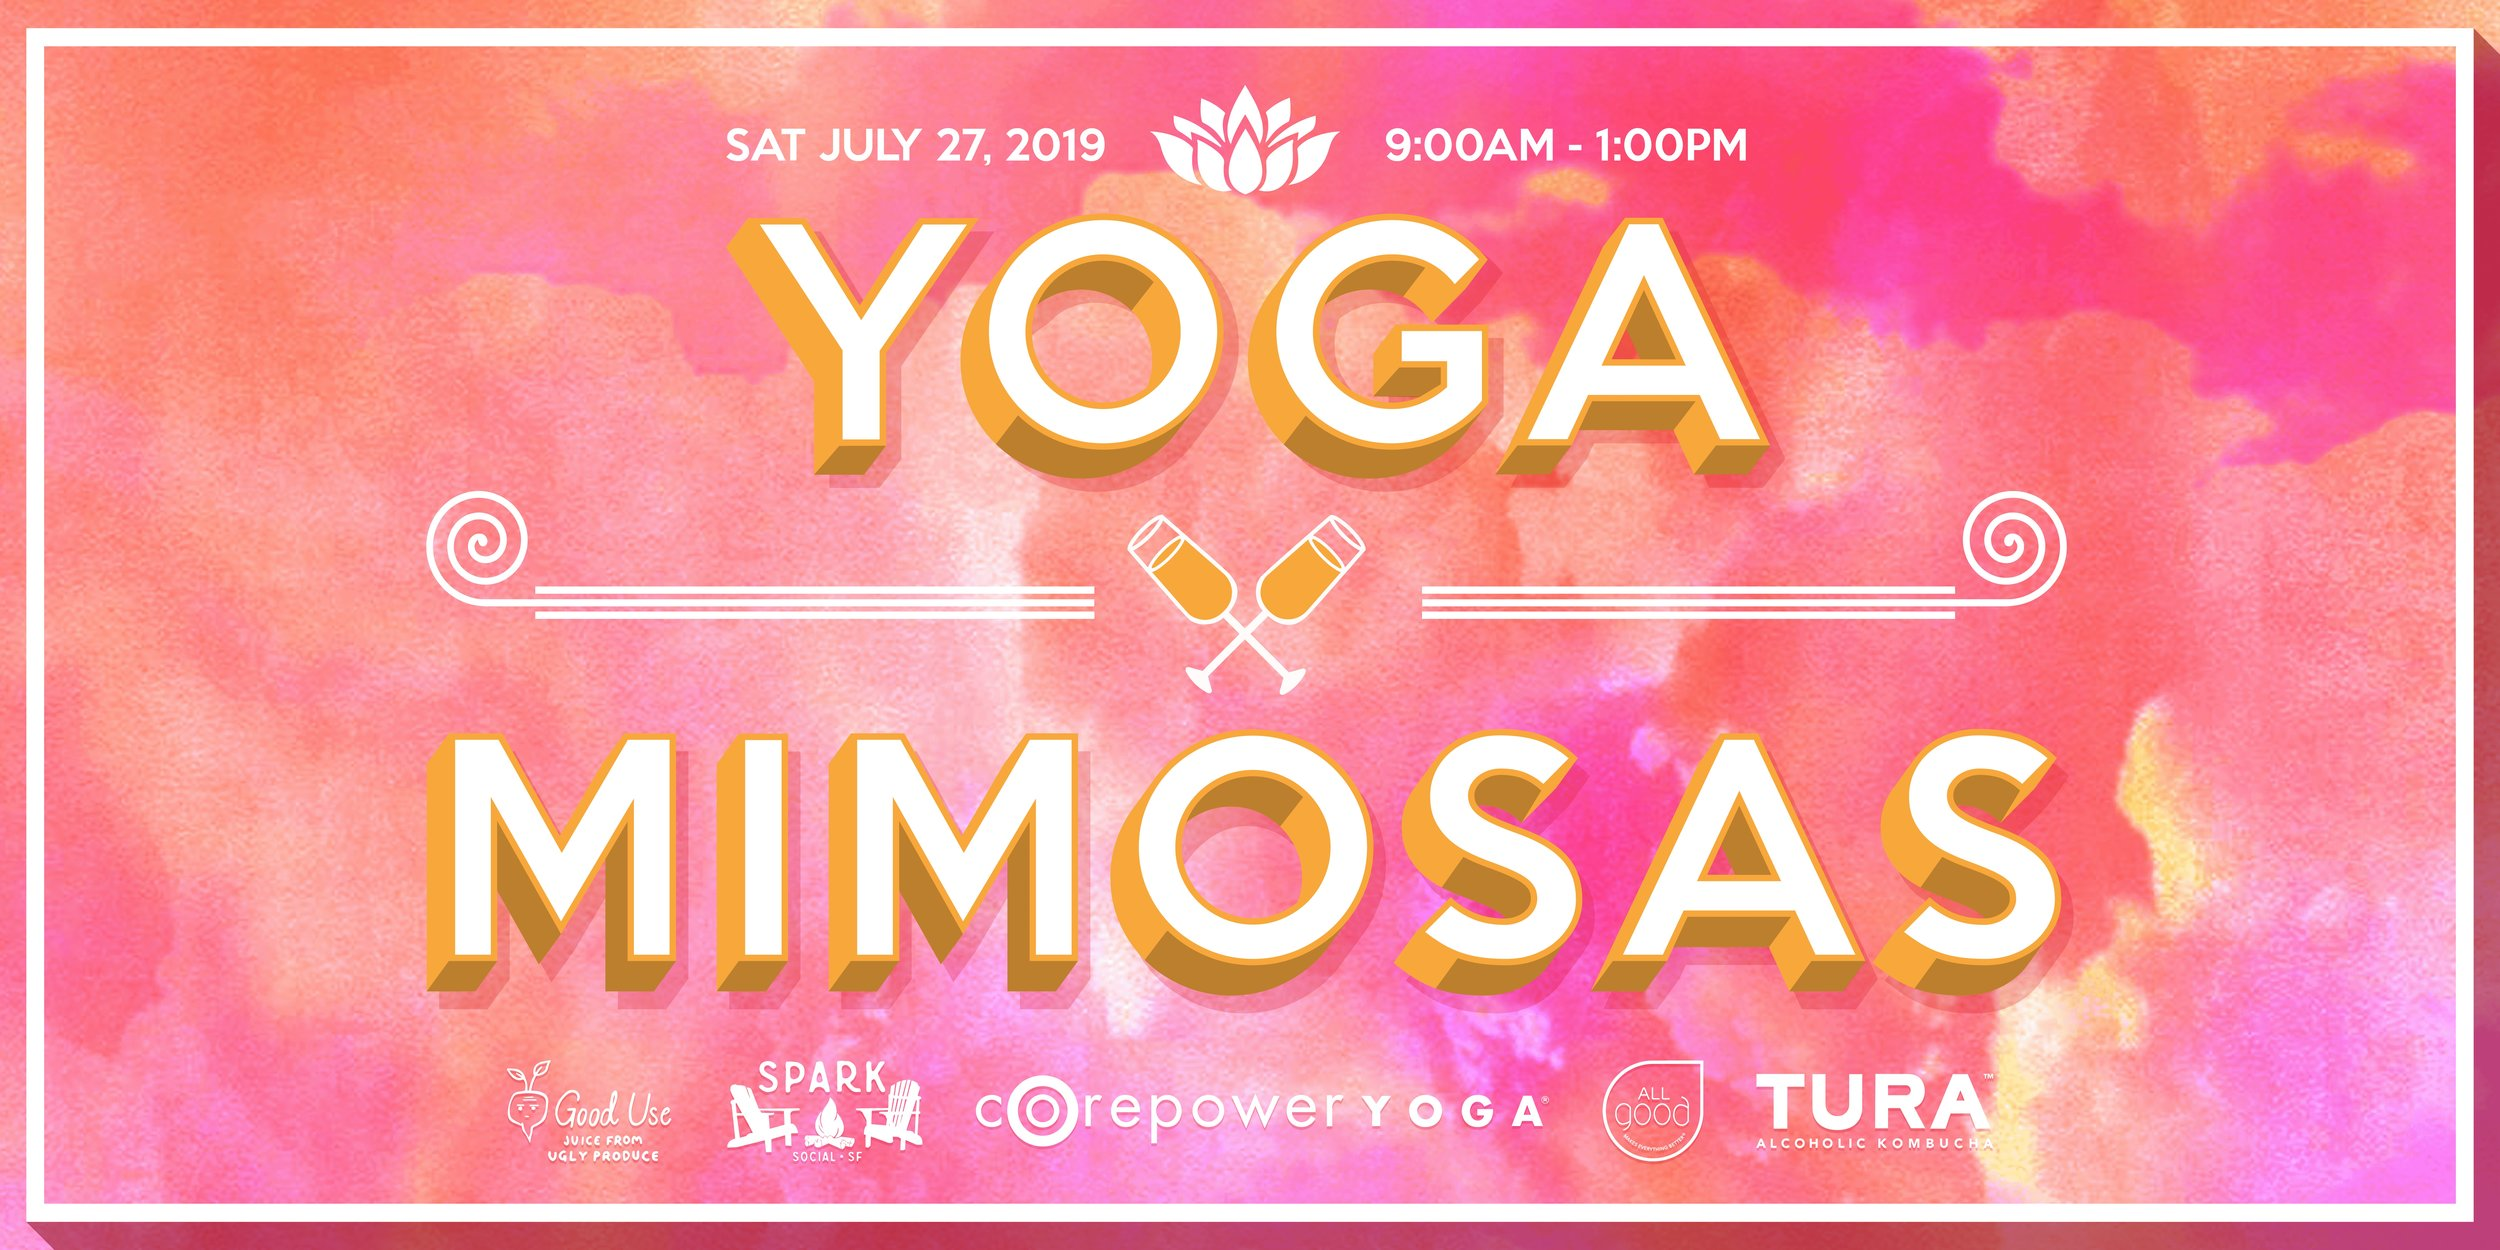 yogaxmimosas-eventbrite-5july-01-min.jpg